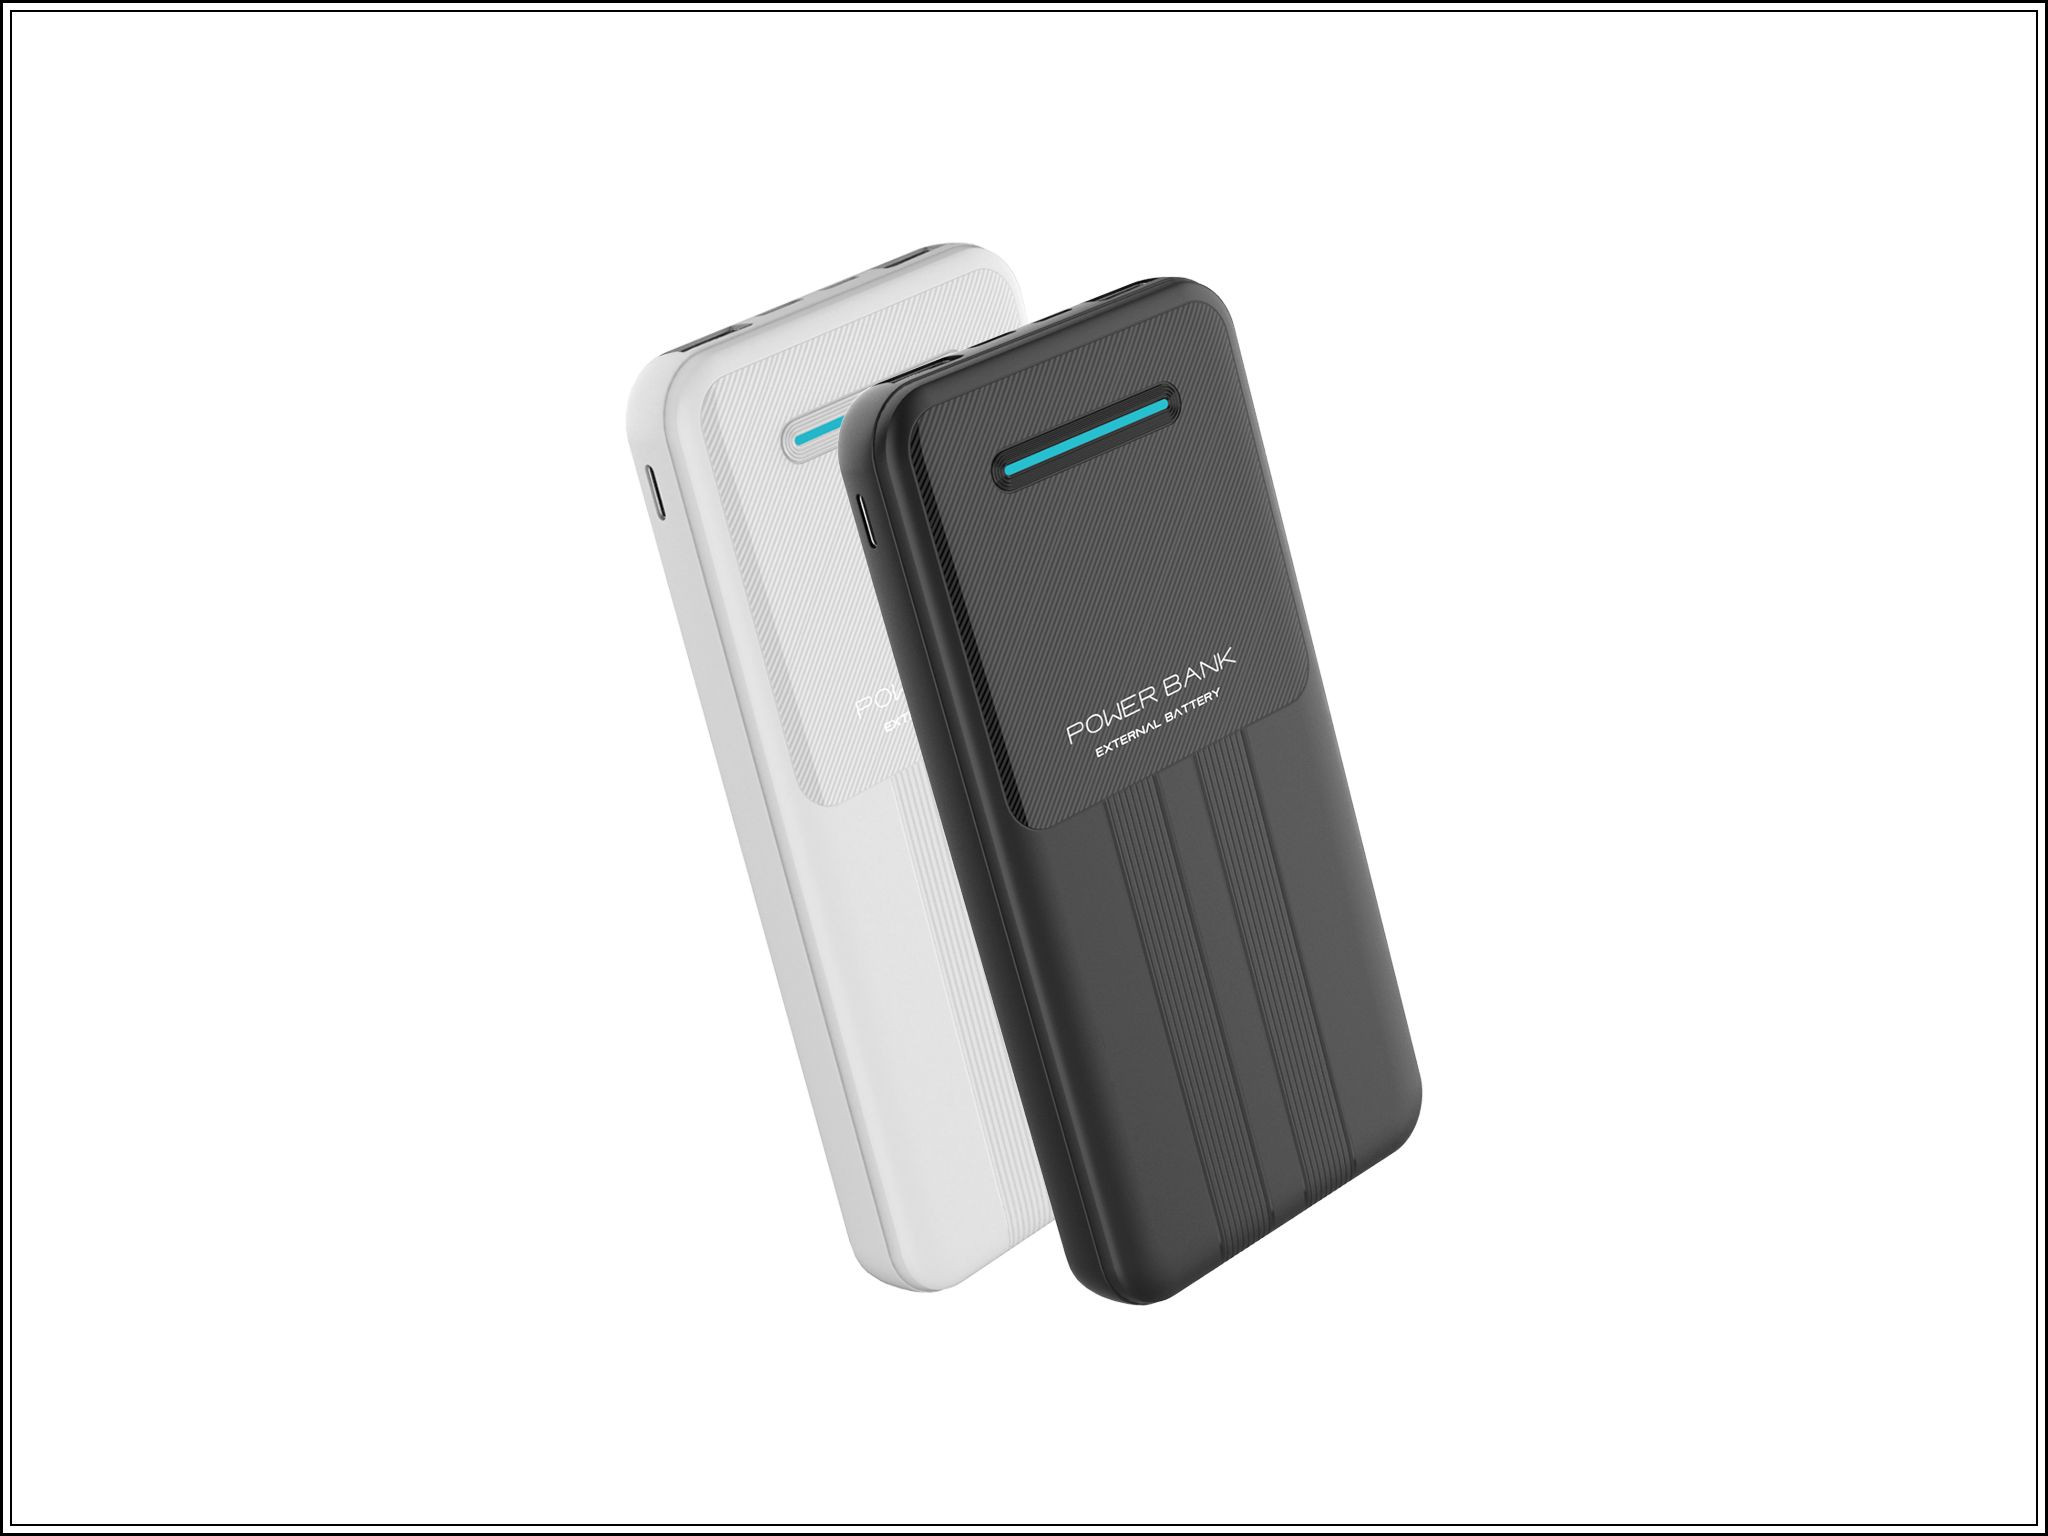 JLY powerbank mobile charger power bank 10000mah fast charging power banks 10000mah